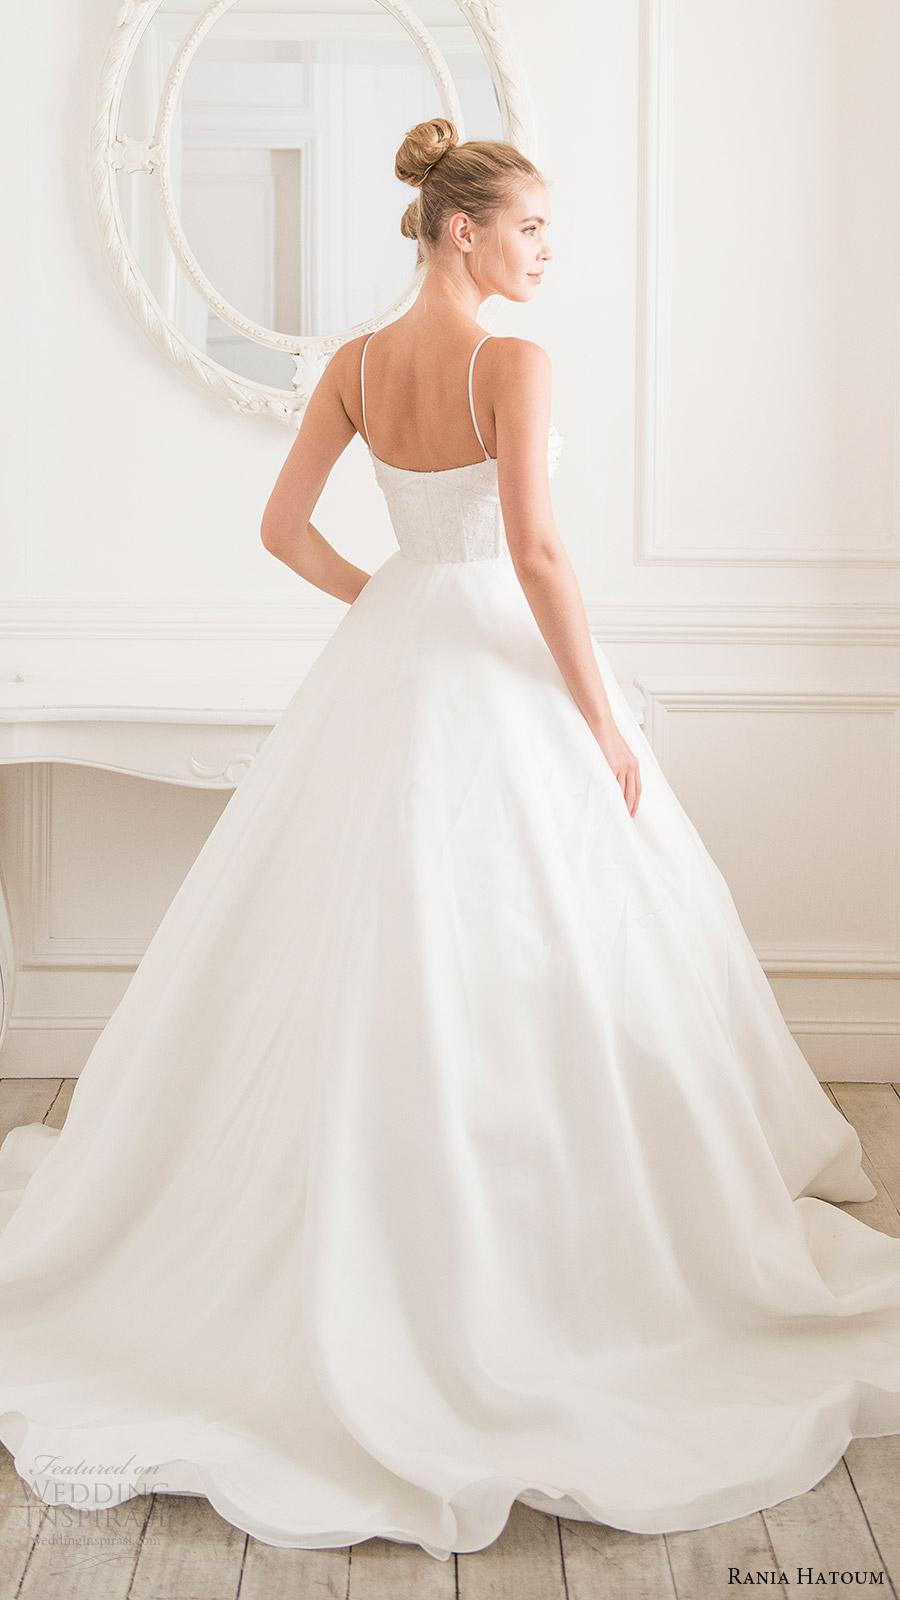 rania hatoum bridal spring 2017 sleeveless spaghetti straps ball gown wedding dress (victorian) bv train